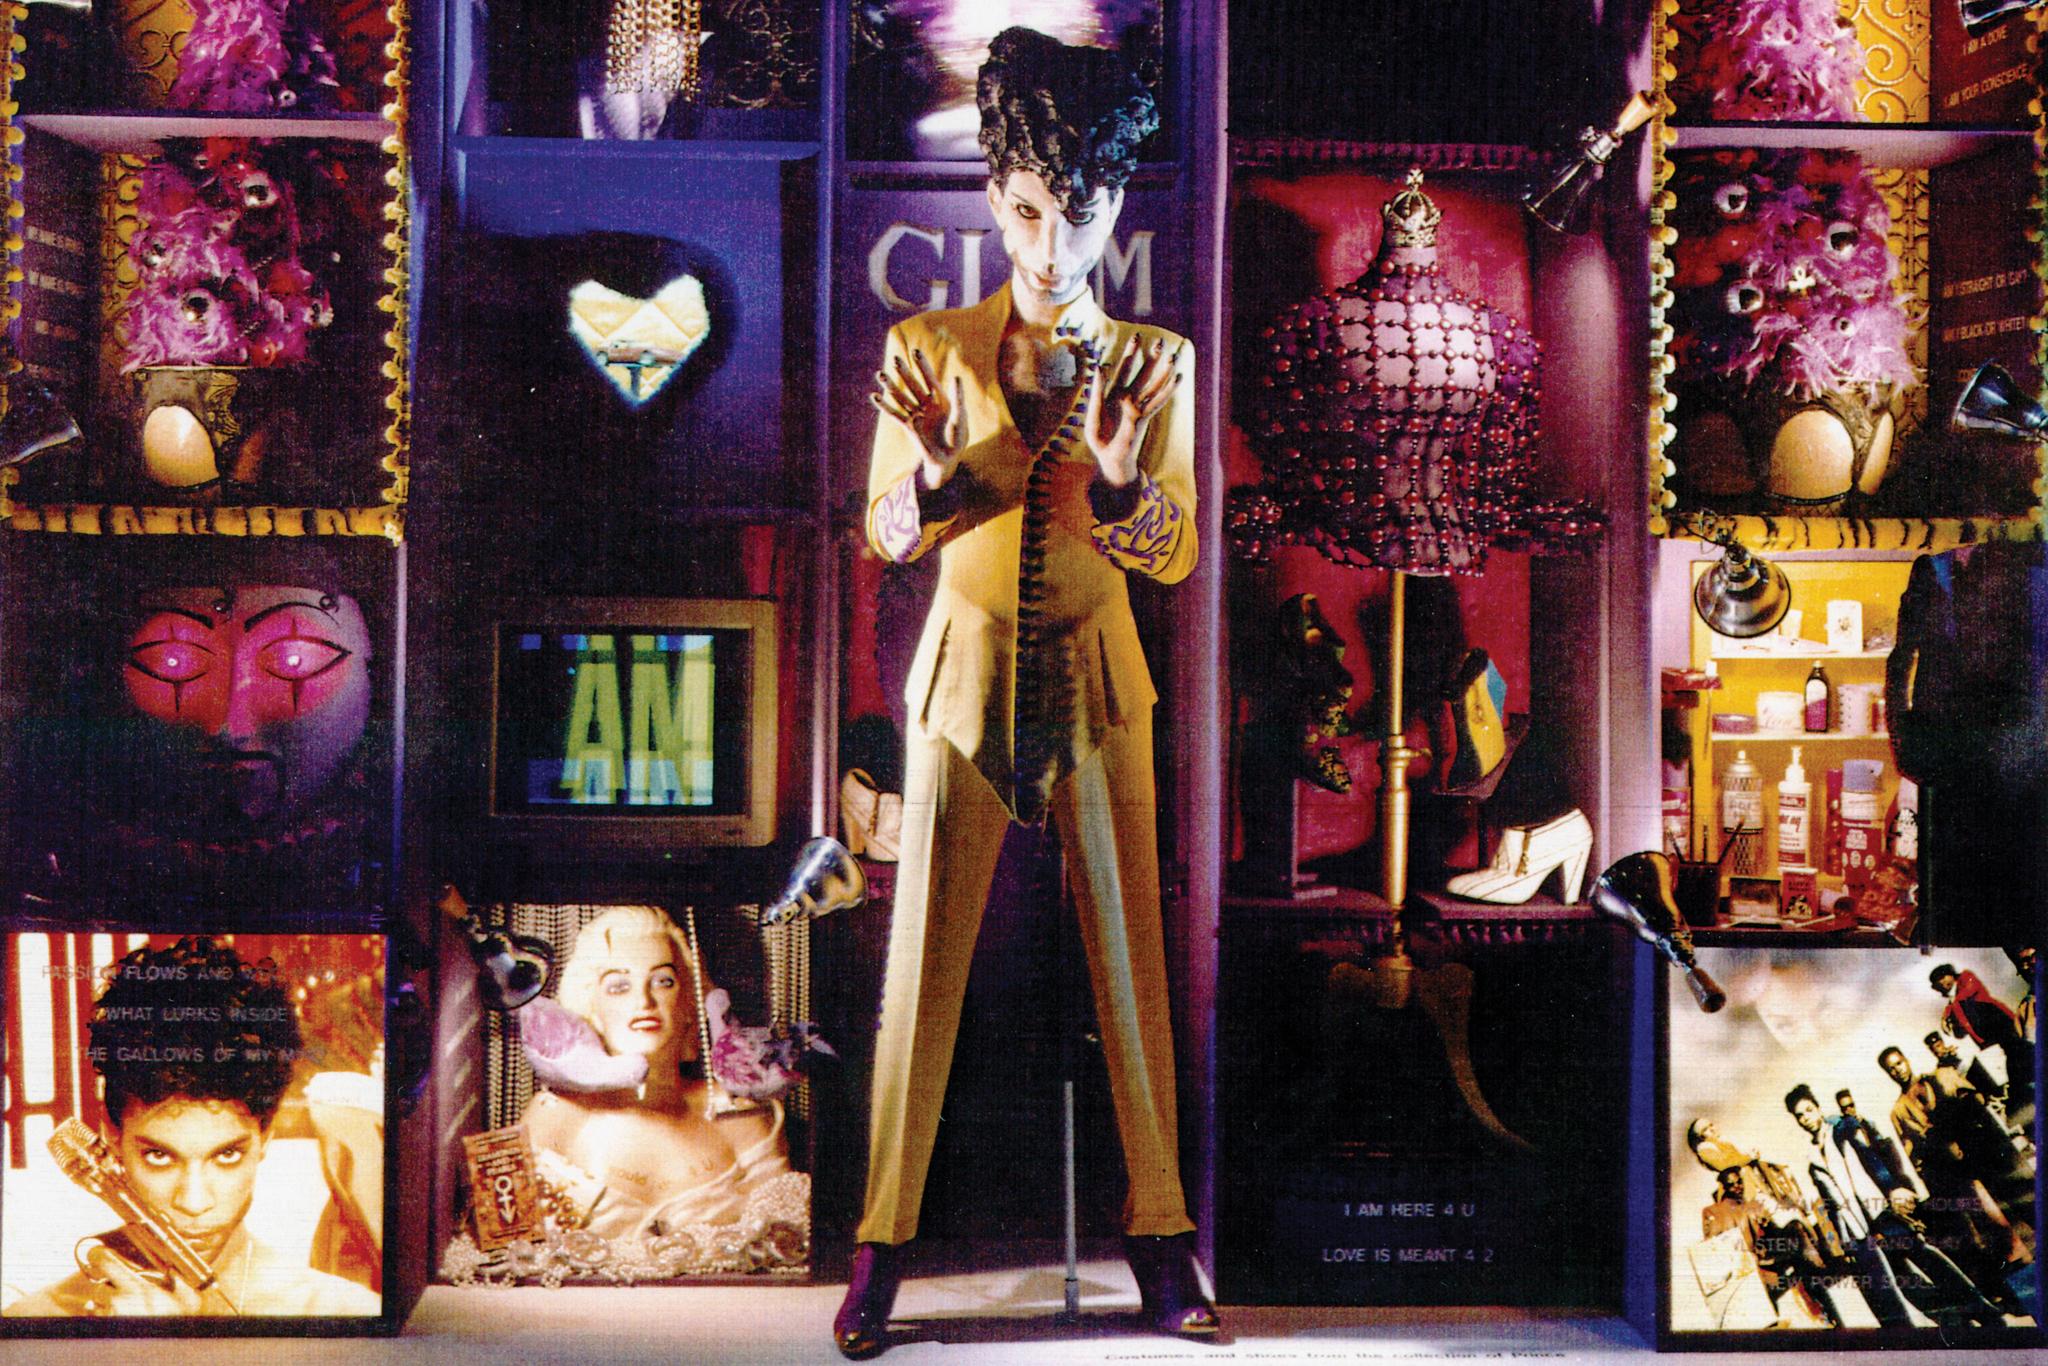 Prince Windows, 1992